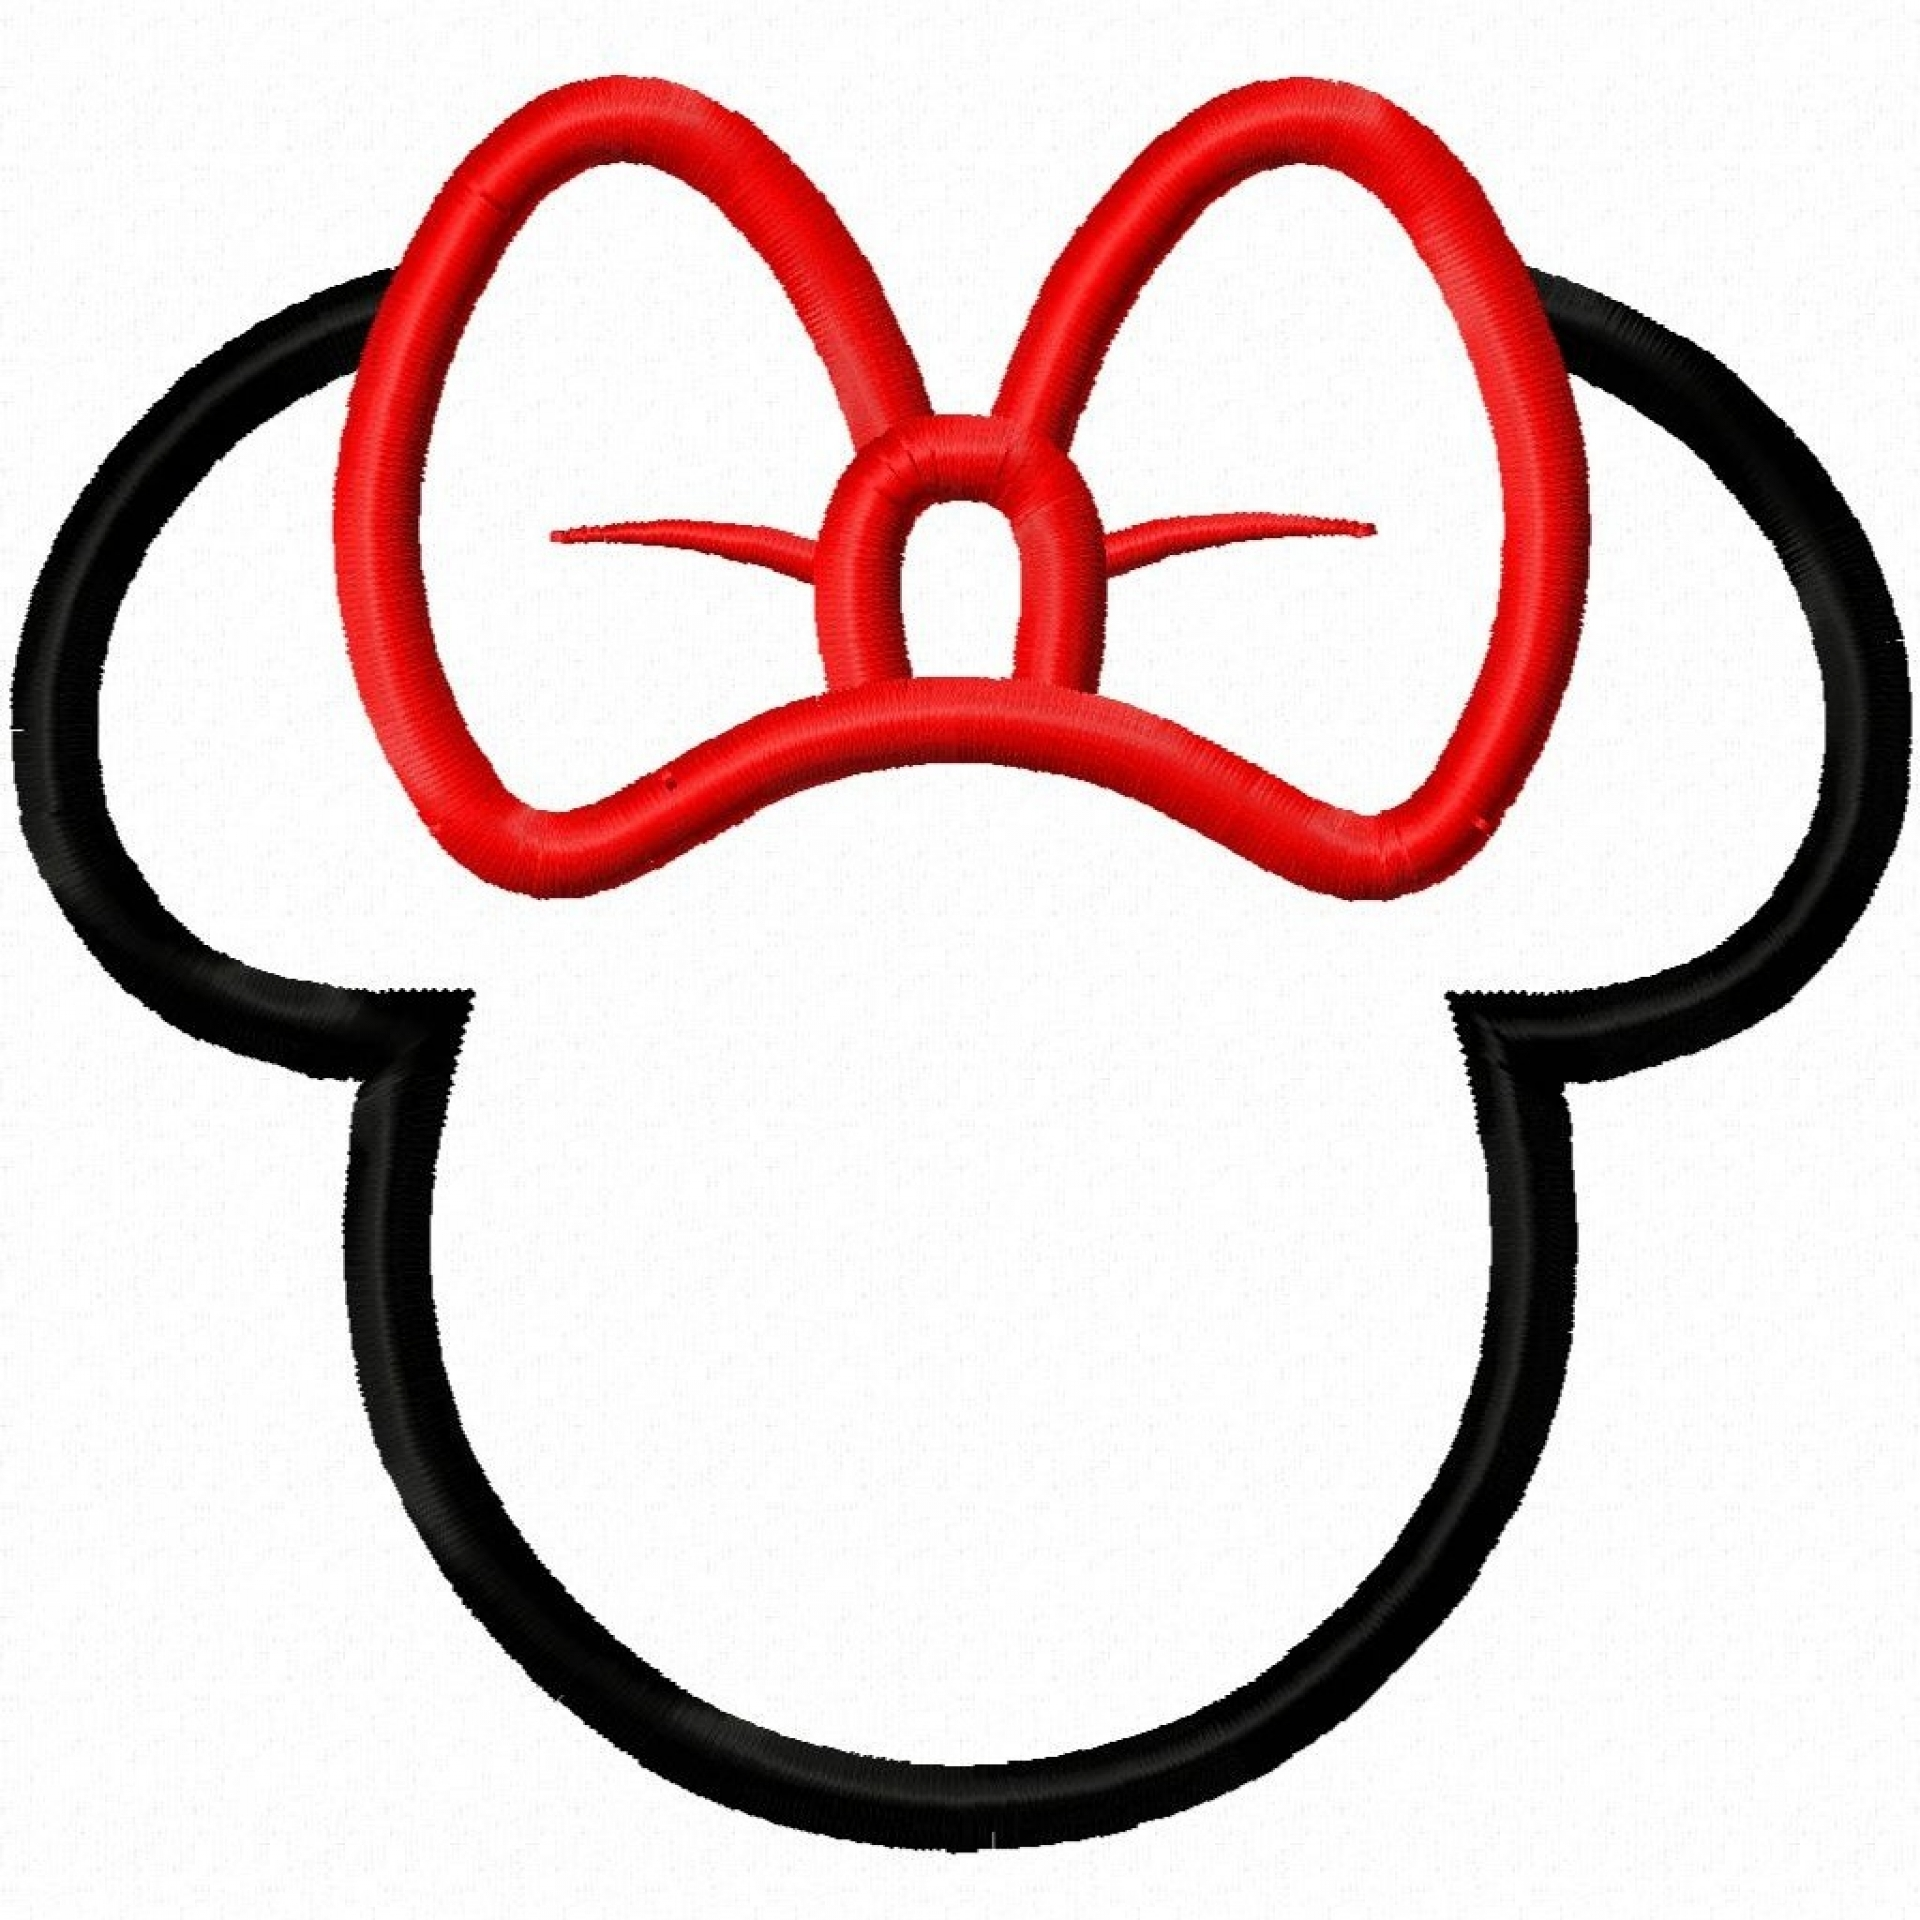 1920x1920 Minnie Mouse Silhouette Clipart Panda